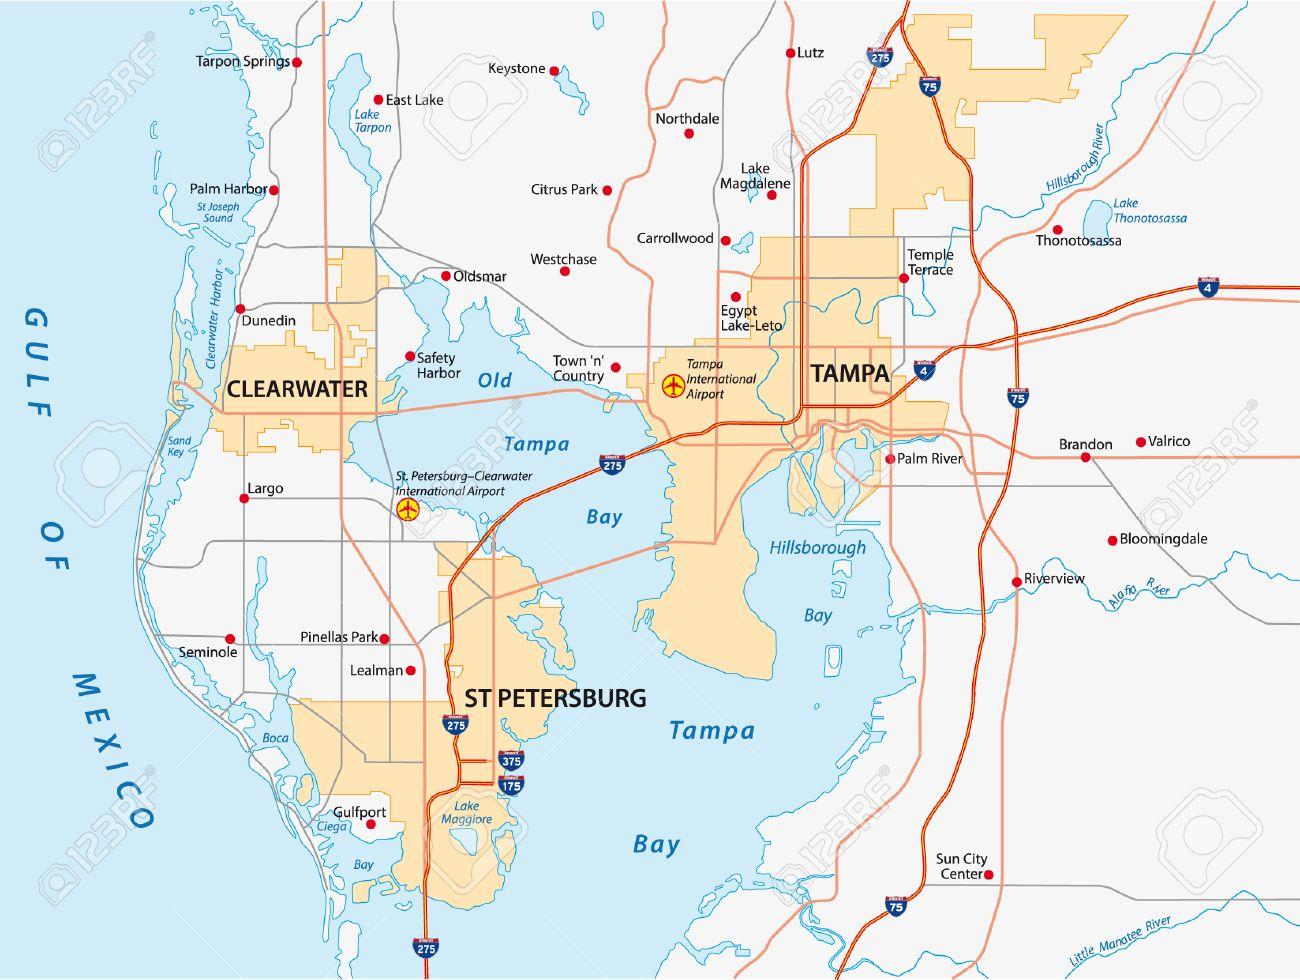 Tampa Bay Area Map Royalty Free Cliparts Vectors And Stock - Florida map vector free